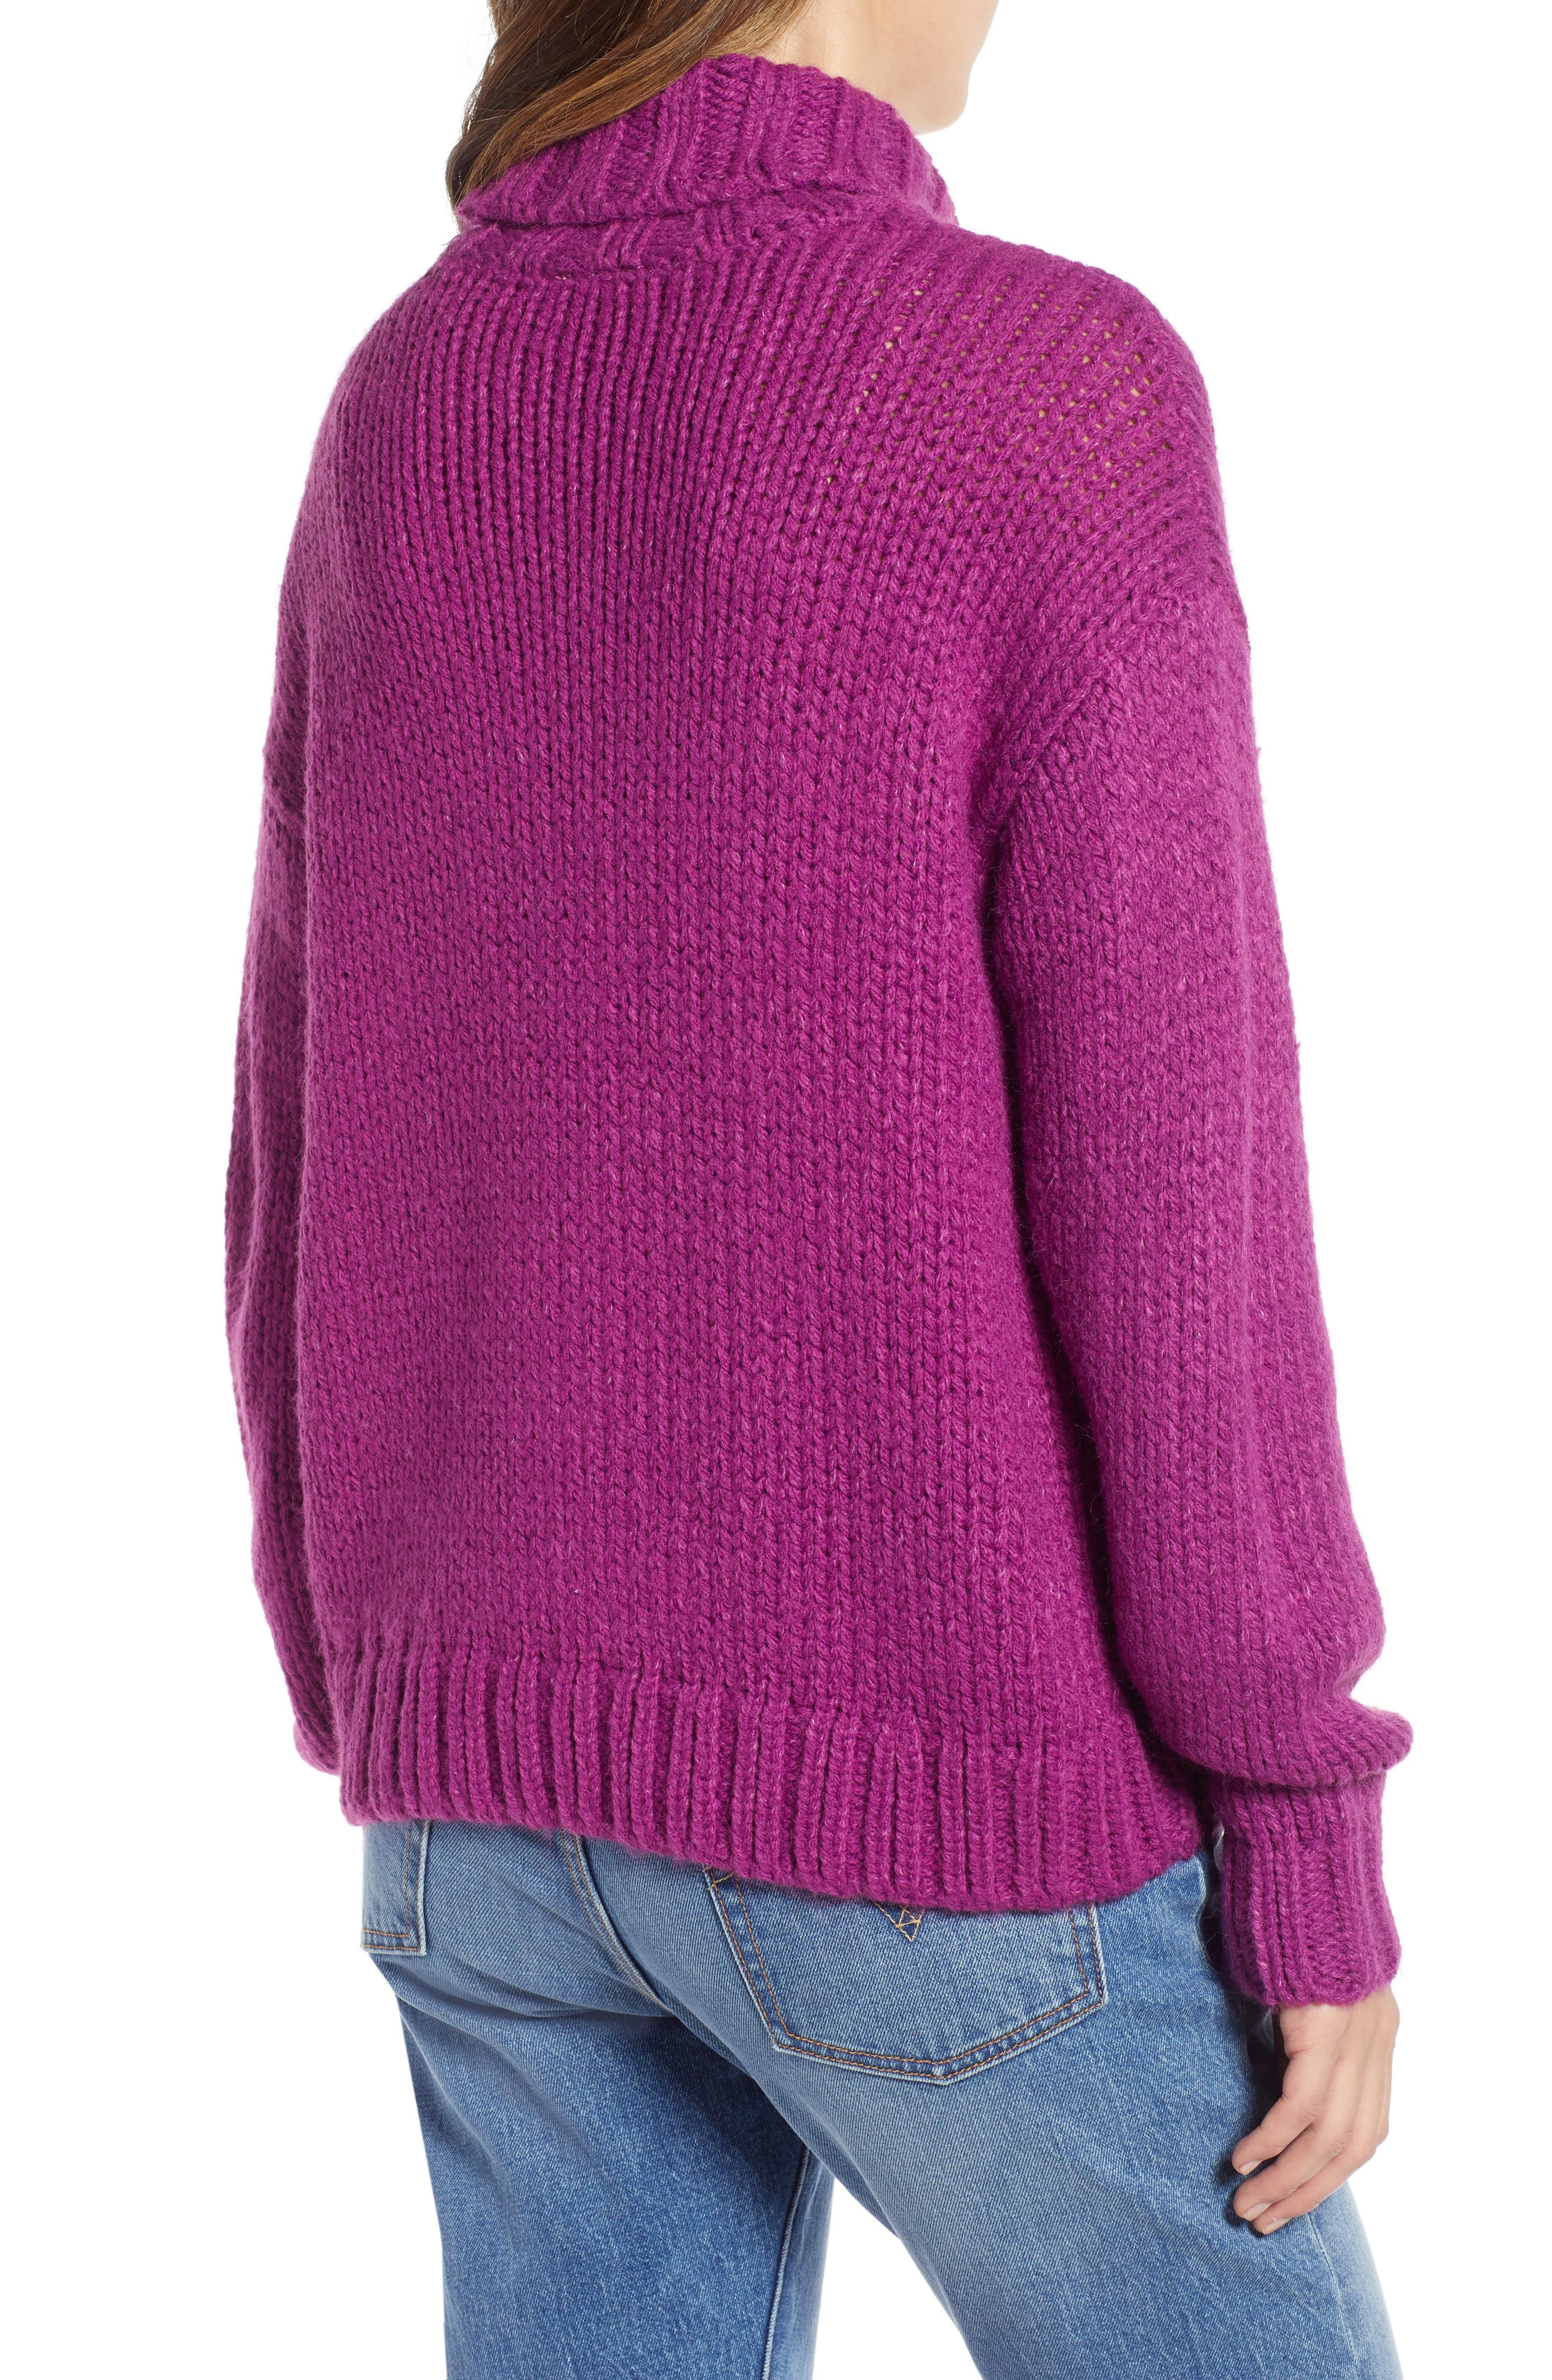 Kira Turtleneck Sweater,                             Alternate thumbnail 2, color,                             HOLLYHOCK